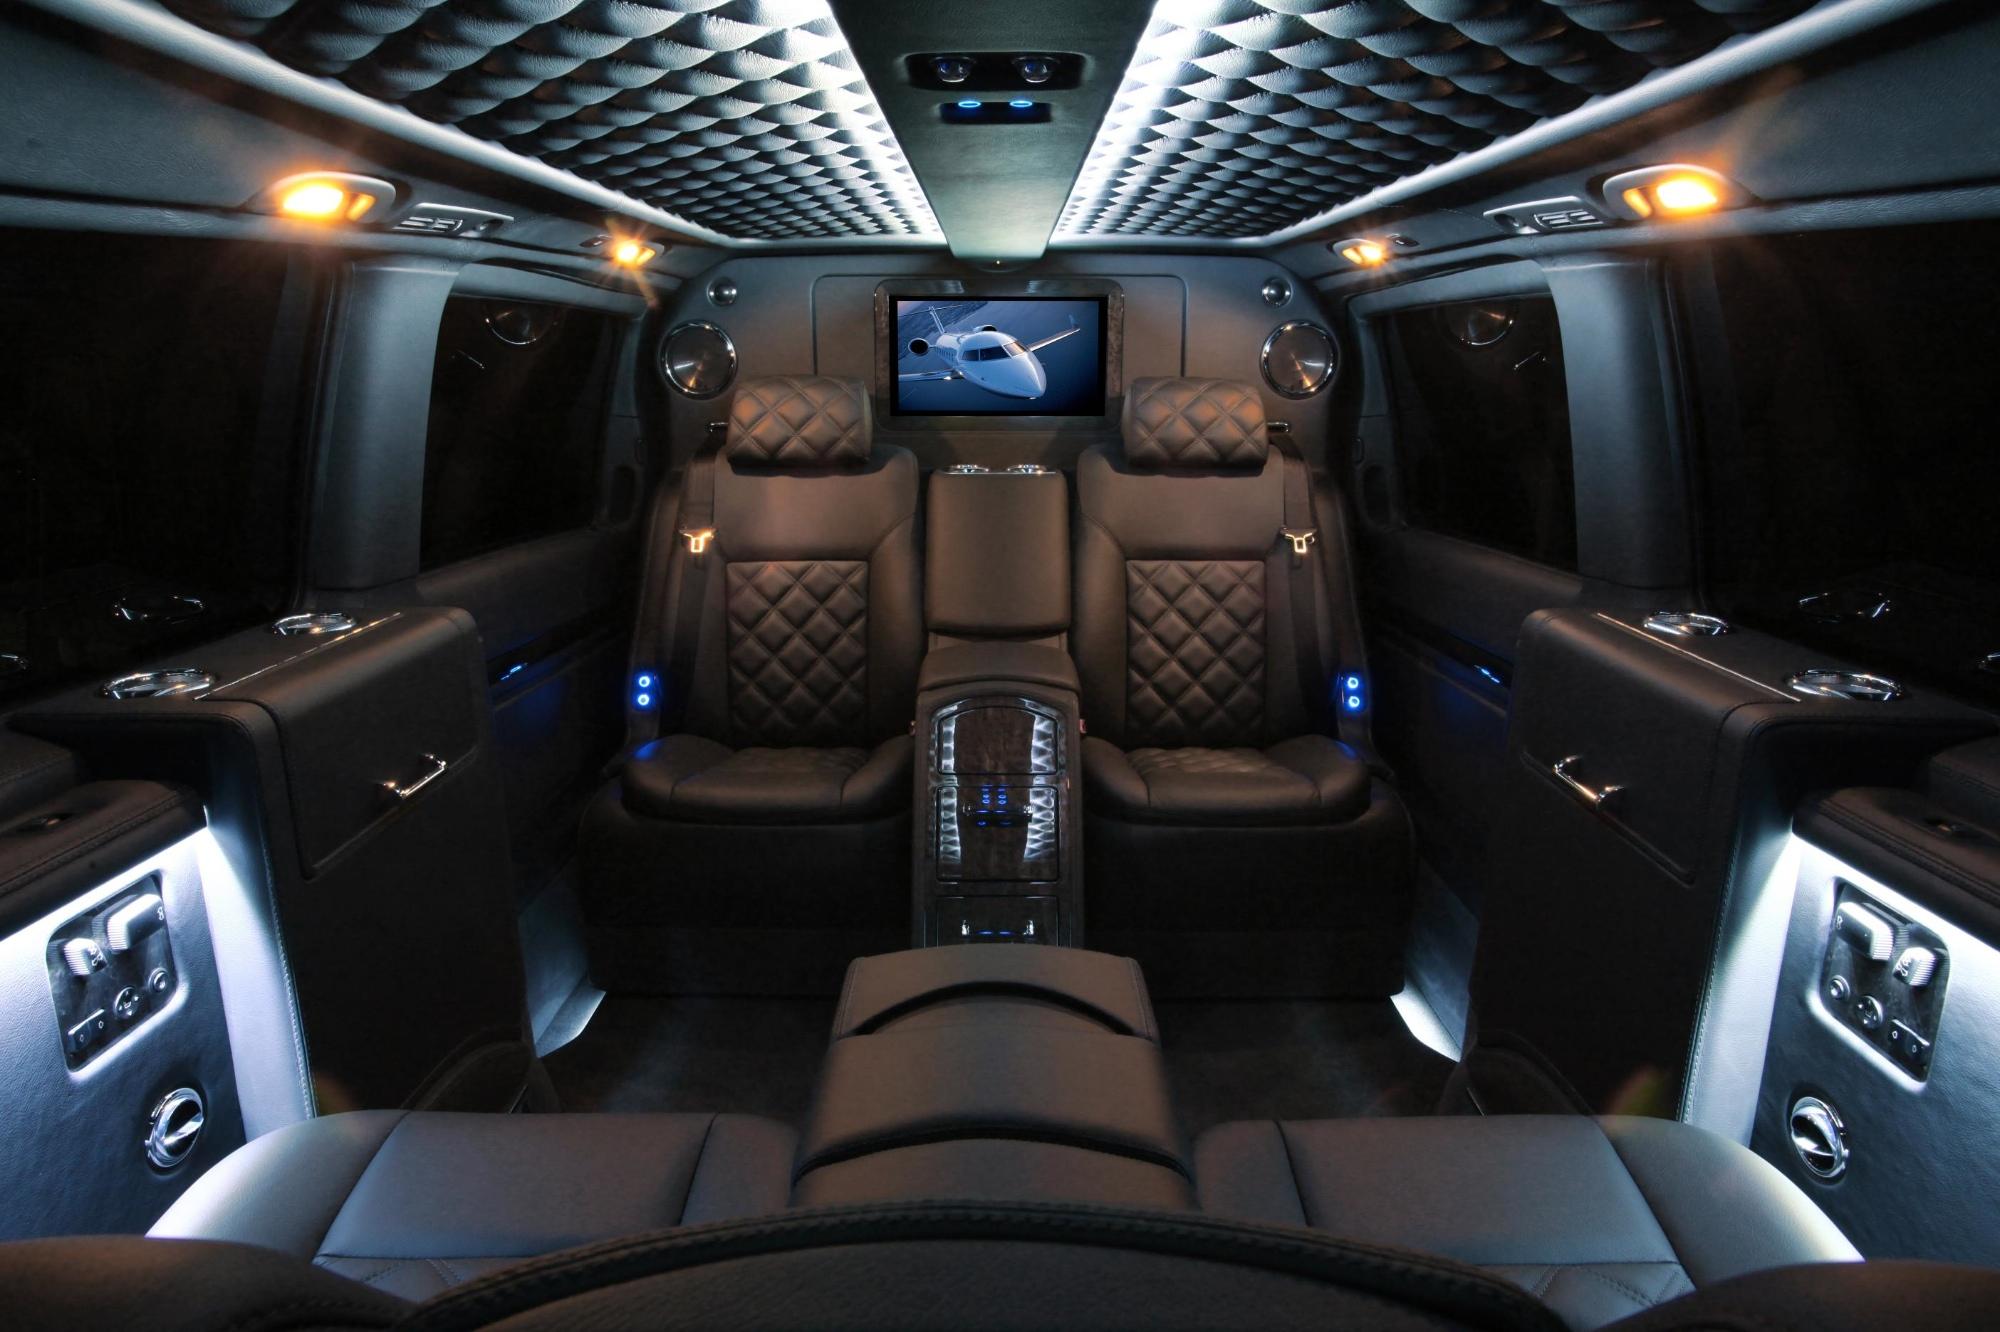 5c9389ca98ec29 ... 11919120 866417860094586 2264333480759274989 n mercedes-benz-sprinter- van-2 mercedes-viano-by-carisma-auto-design-is-the- Mercedes Sprinter Luxury  ...